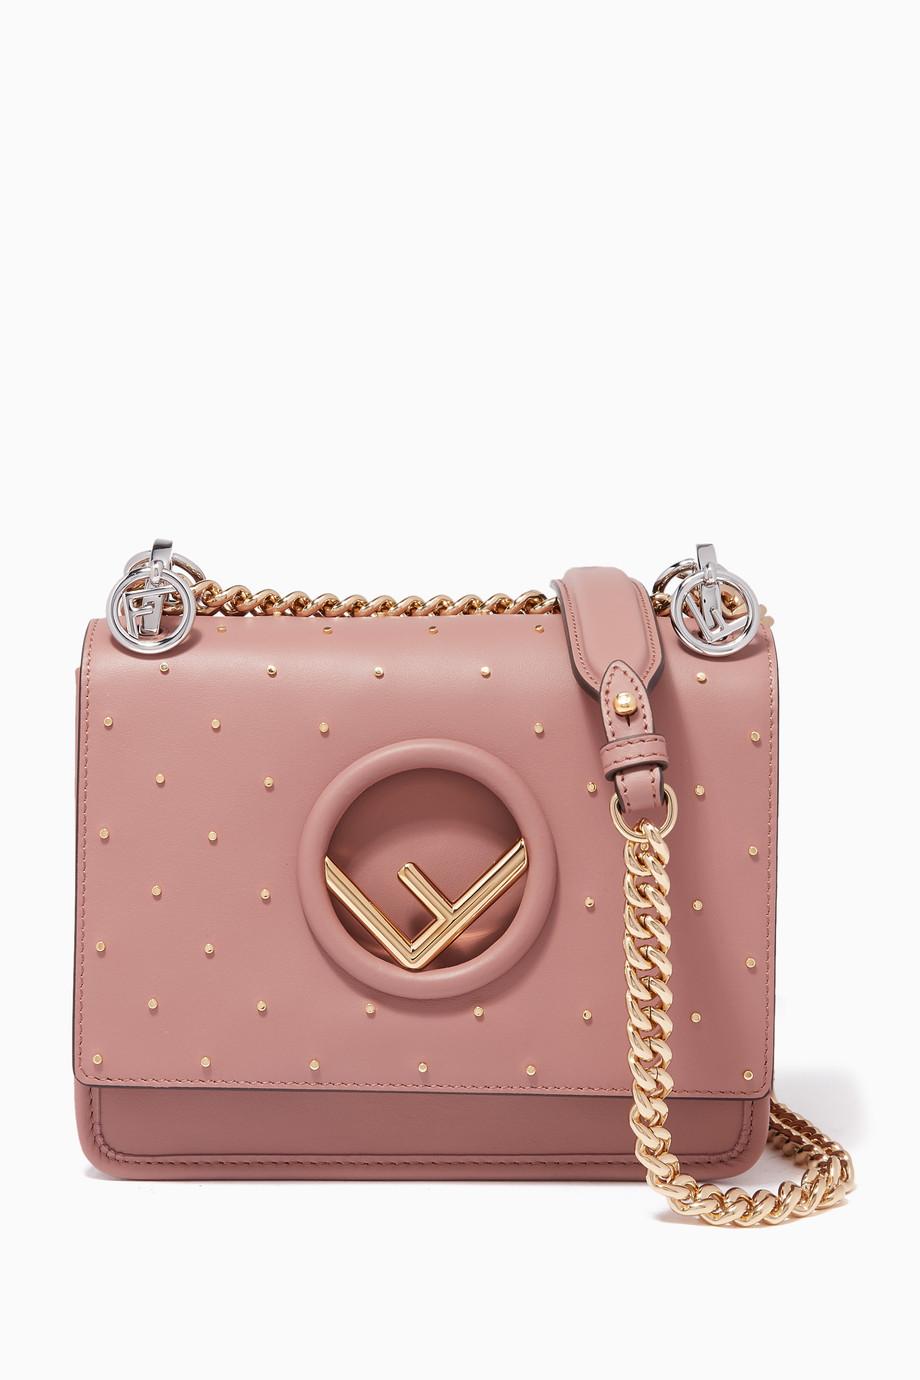 729b3d0e3ae7 Shop Fendi Pink Antique-Rose Small Kan I F Shoulder Bag for Women ...